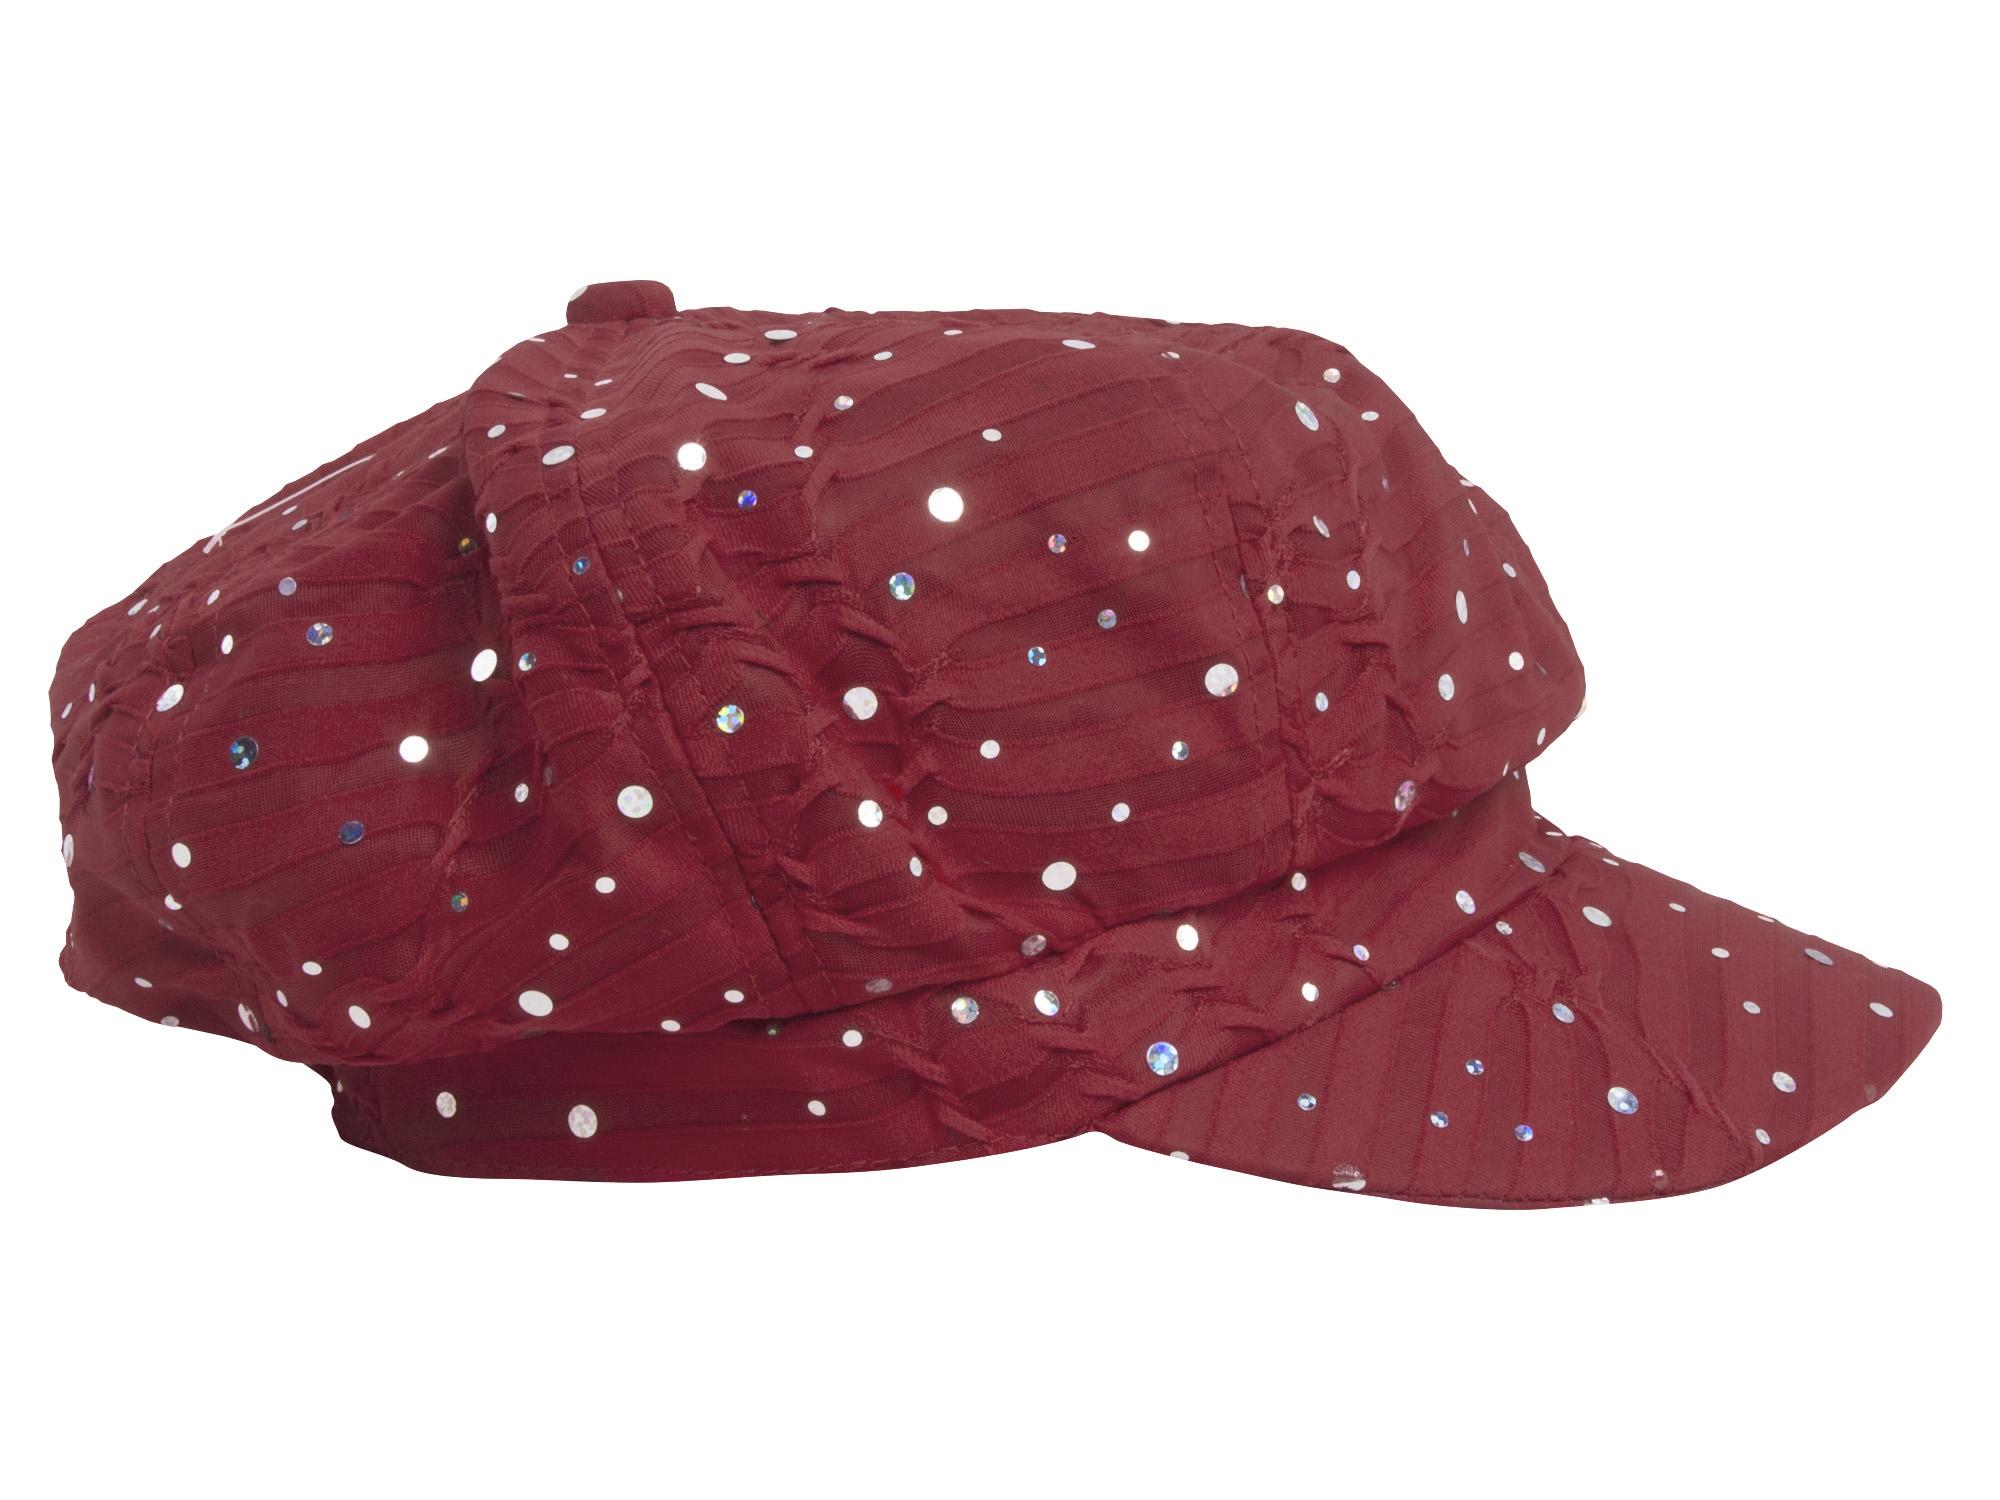 Women-039-s-Glitter-Sequin-Trim-Newsboy-Style-Relaxed-Fit-Hat-Cap thumbnail 39